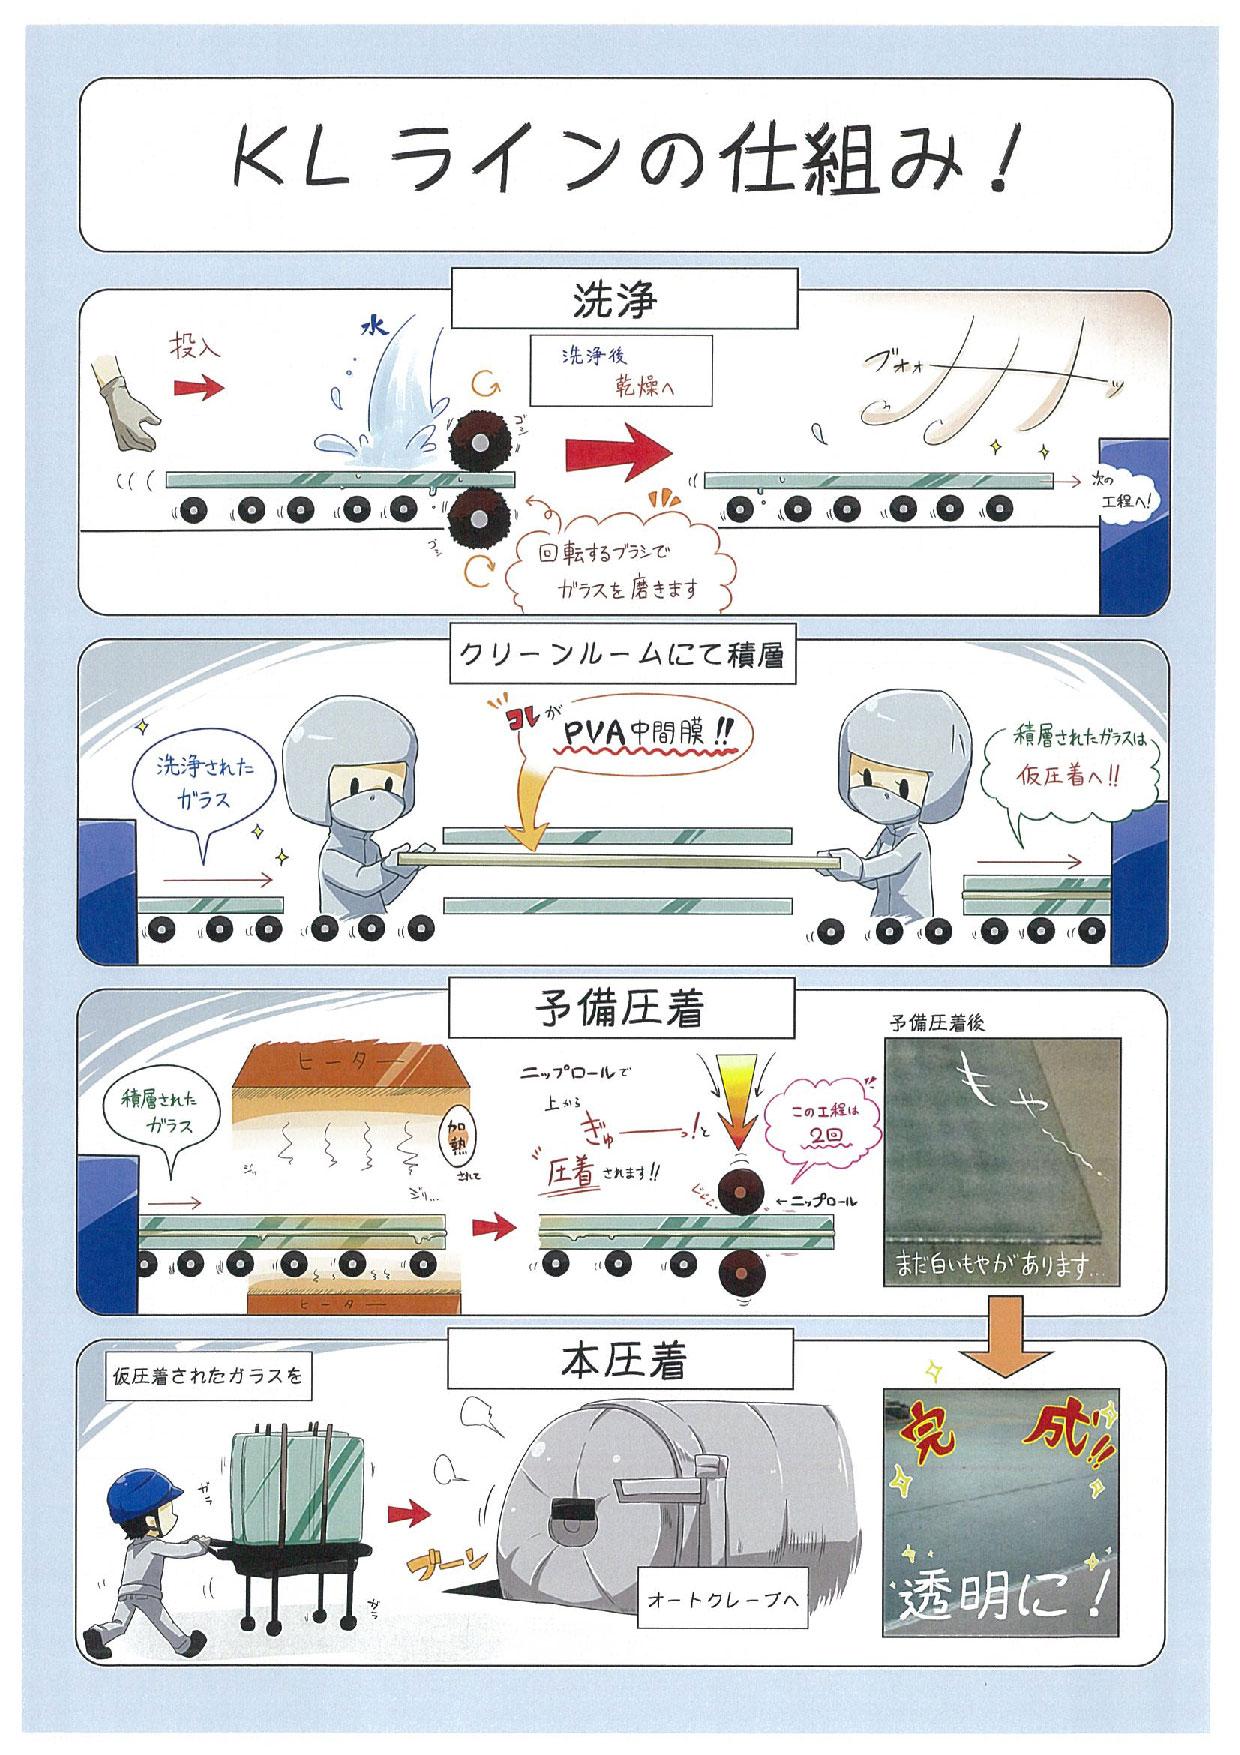 https://www.sanshiba-g.co.jp/images/setubi/Autoclave.jpg